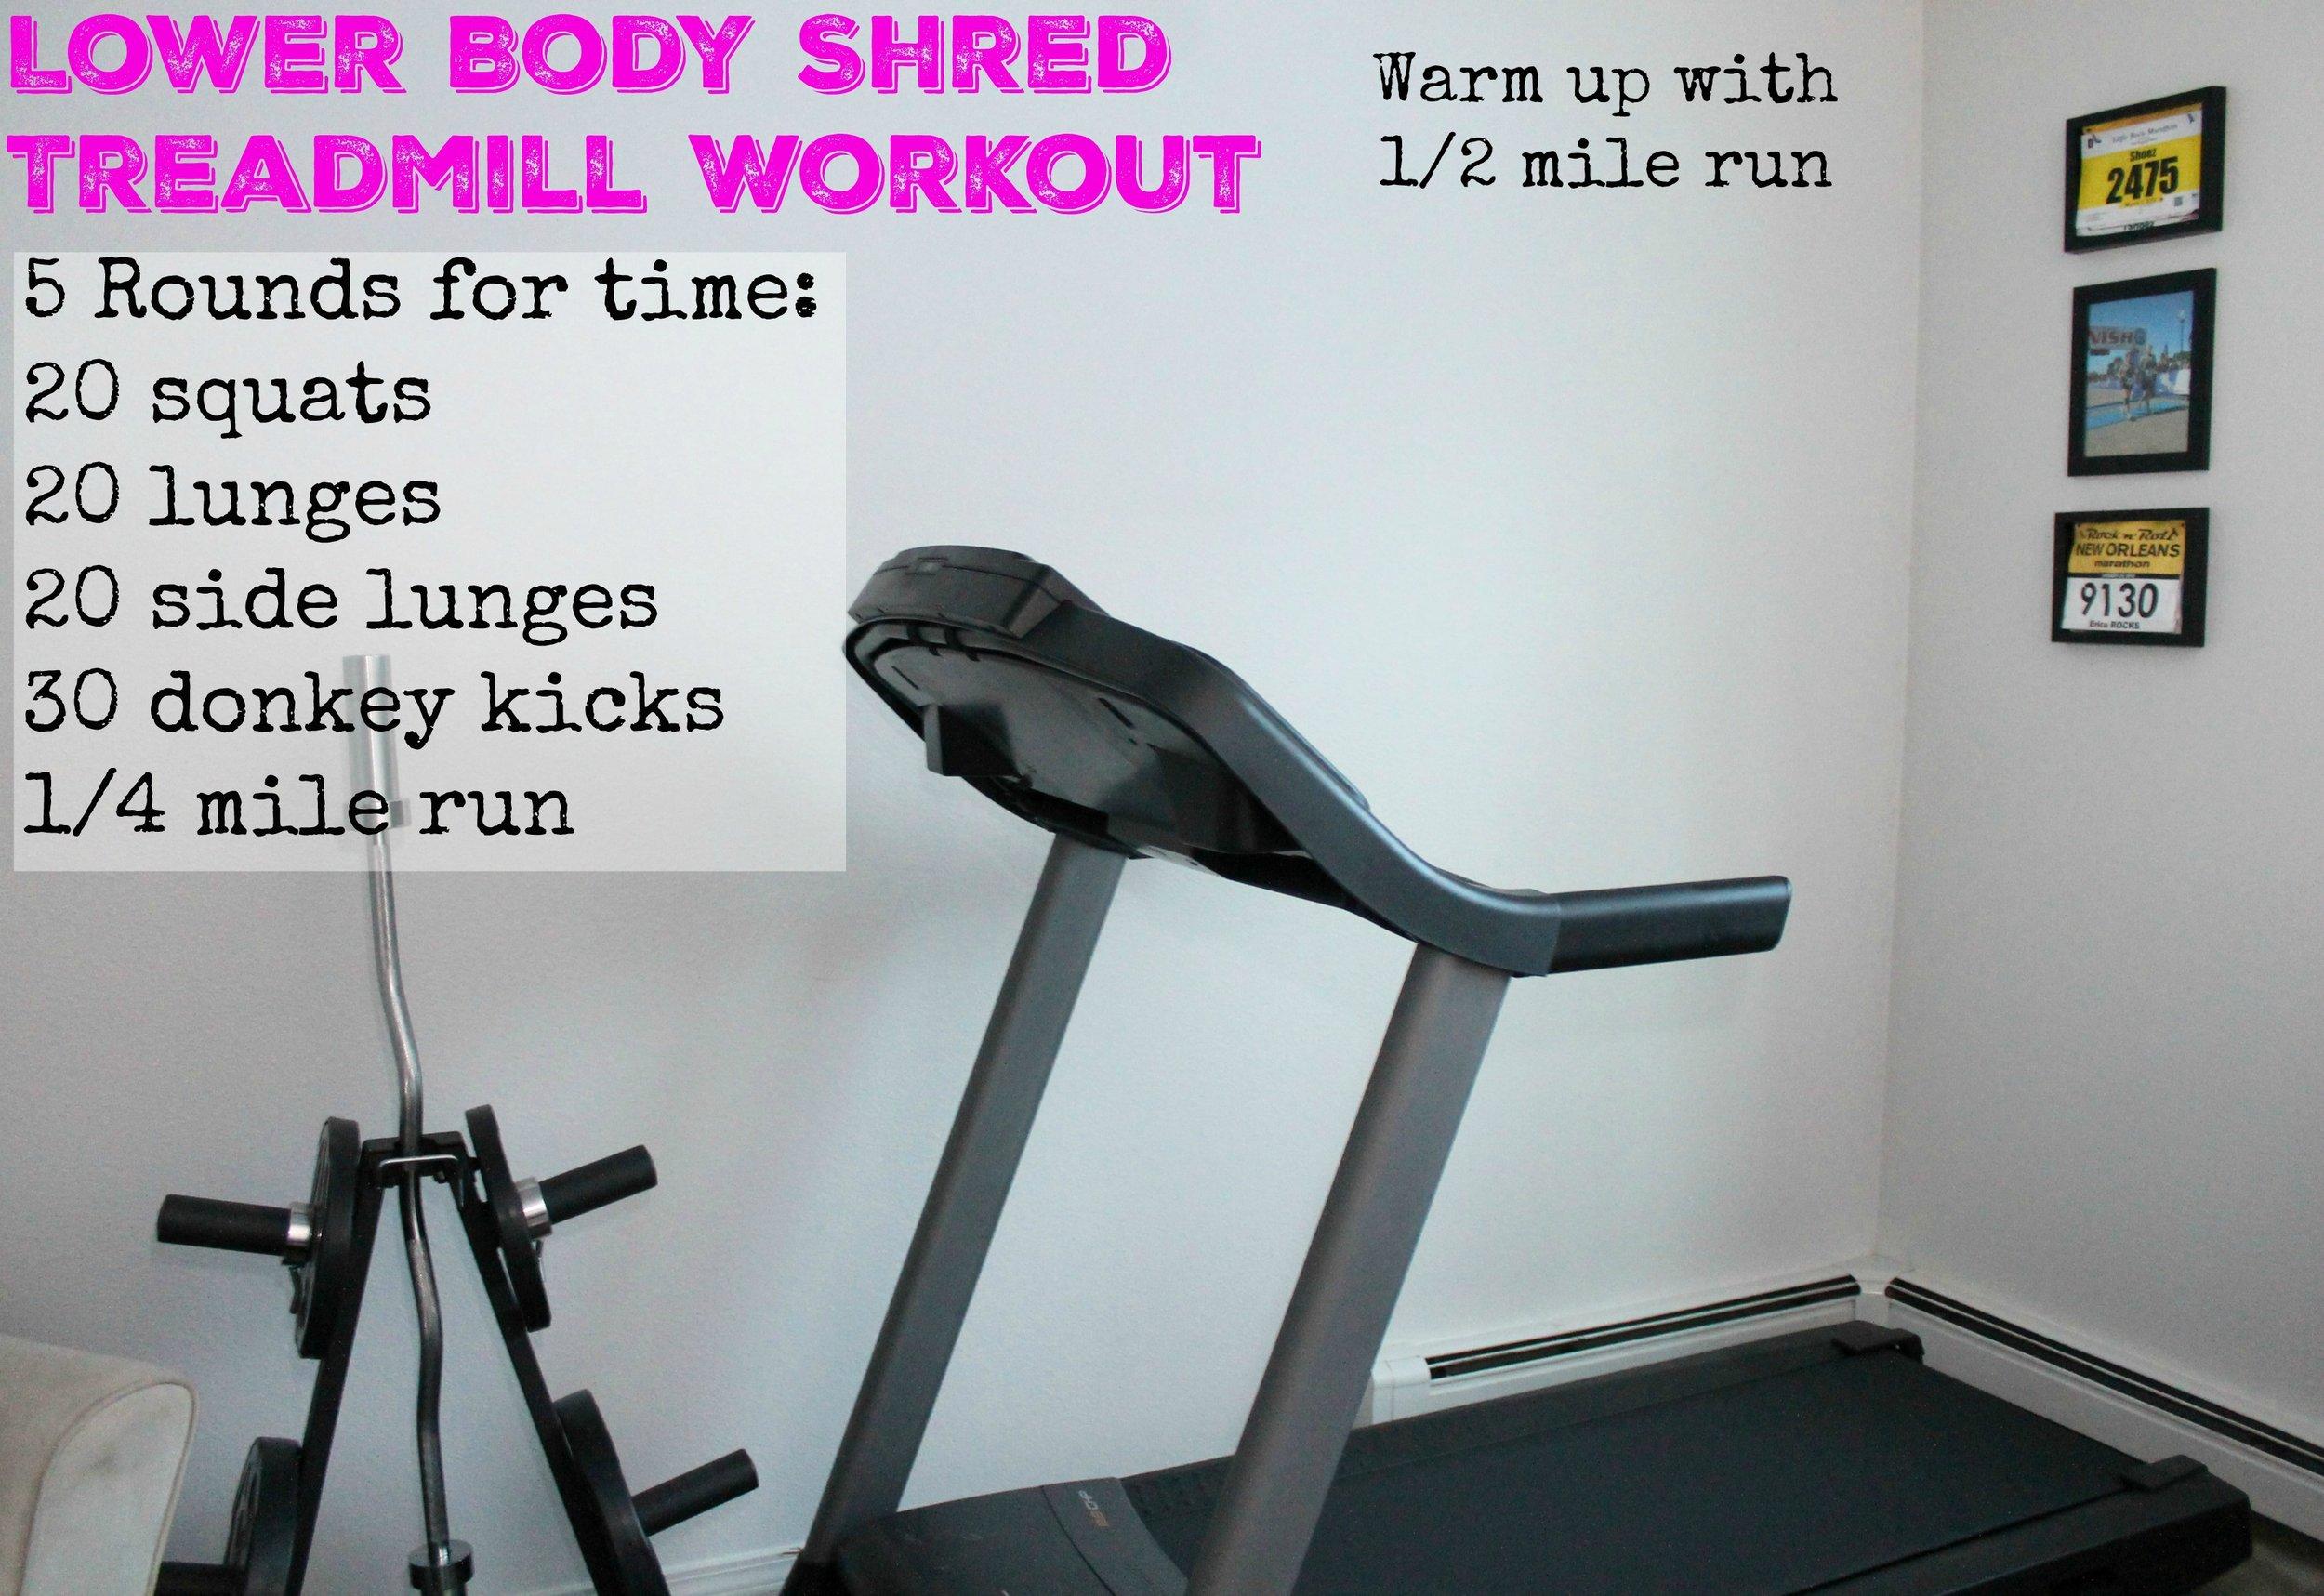 Lower Body Treadmill Workout 1